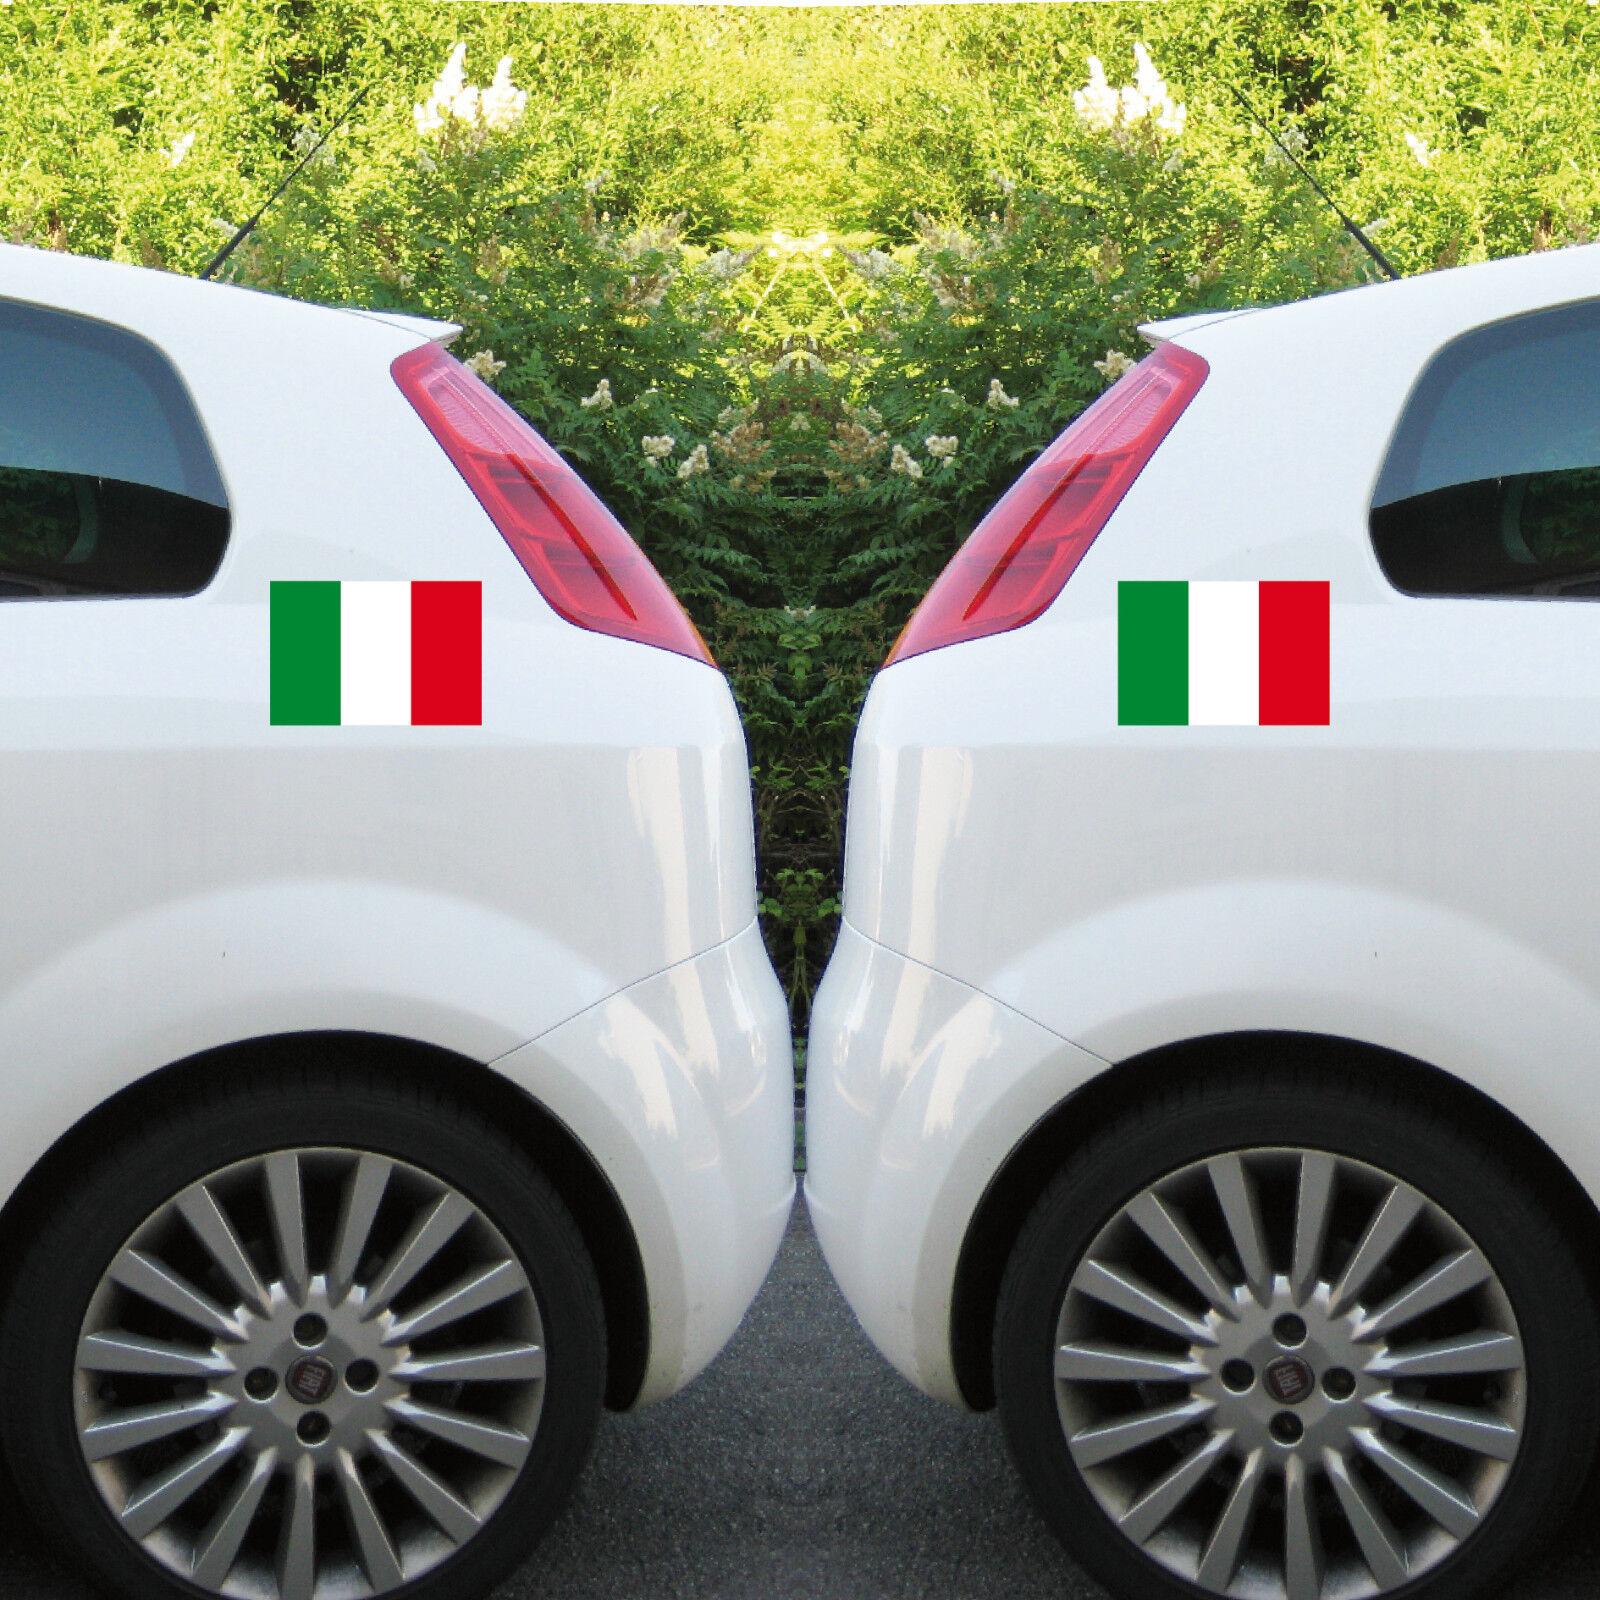 2 Aufkleber Tattoo 22cm Auto Folie Italia Italien Italy Mod Scooter Vespa Roller